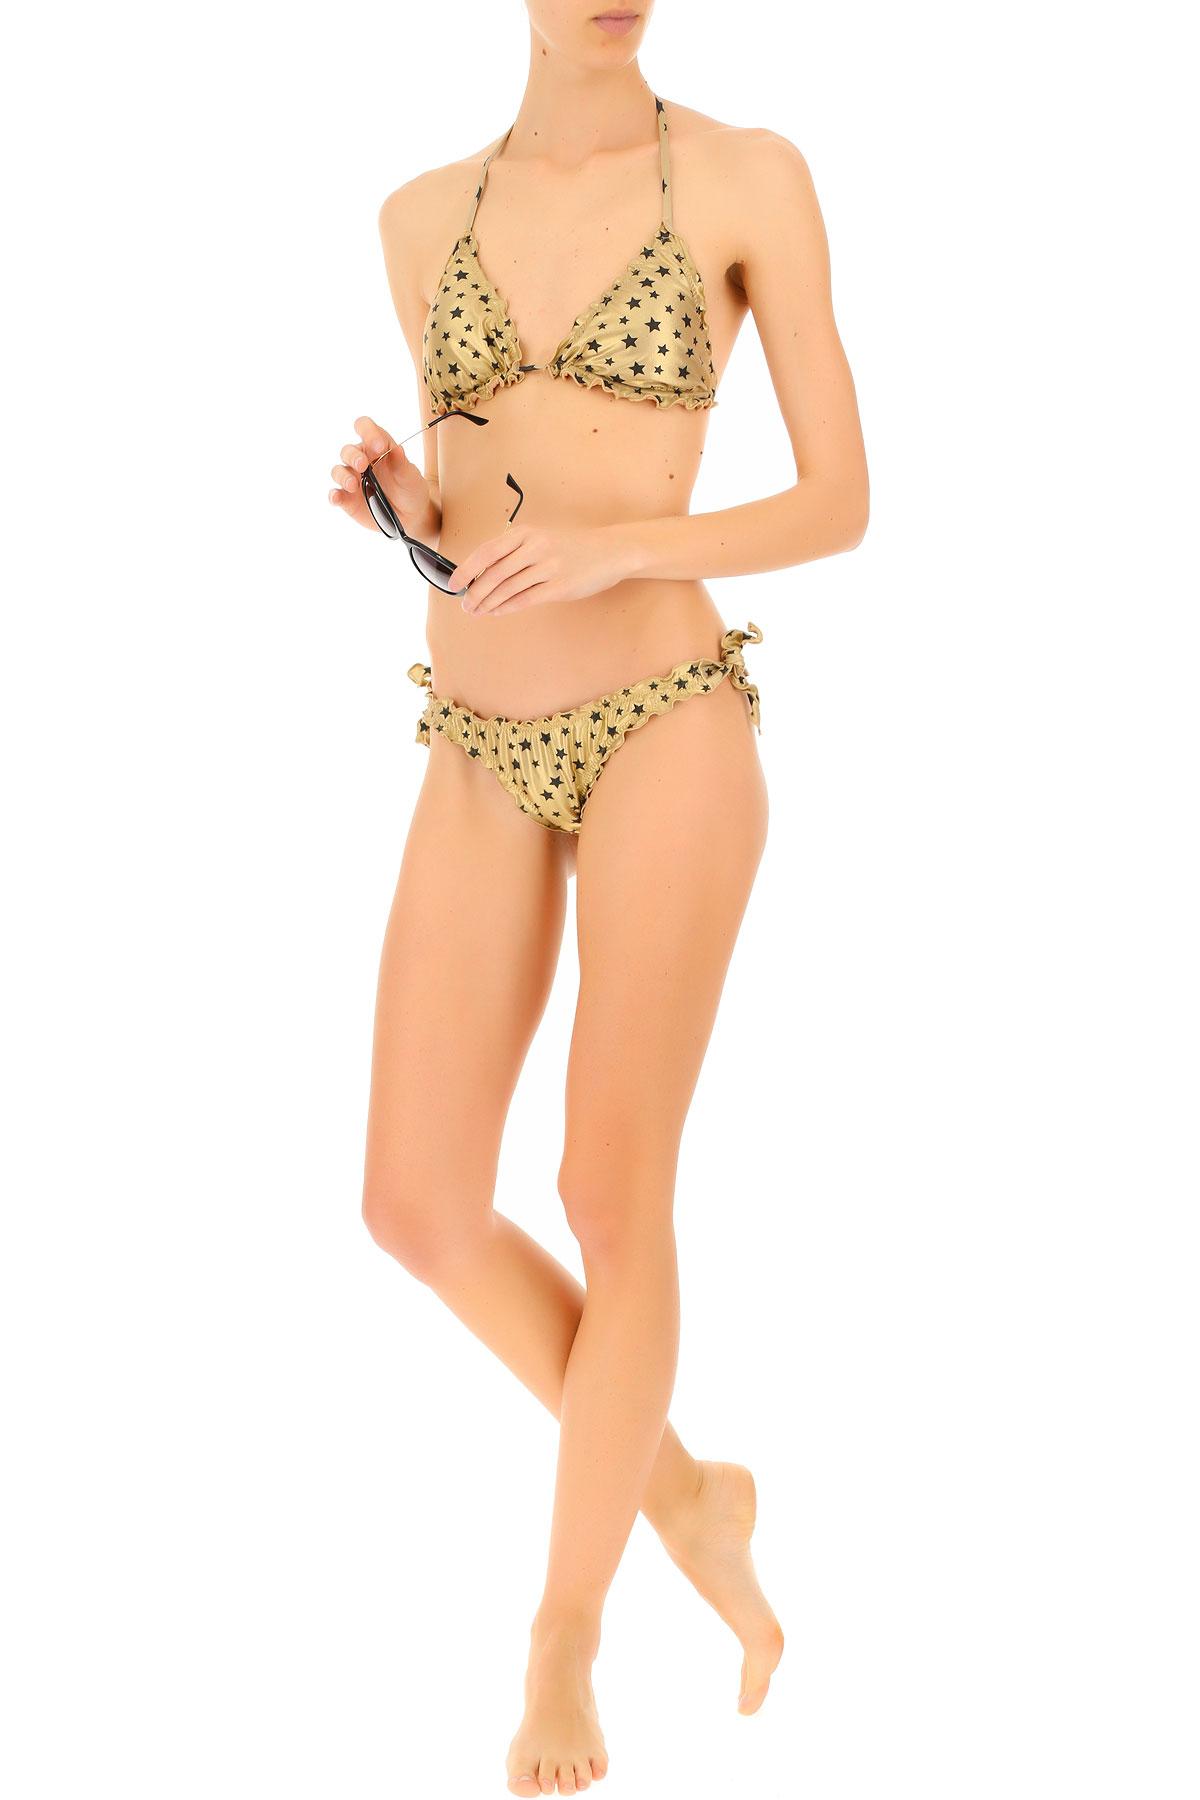 Bikini 19 Ropa Para Otoño Branz Negro Oro 2018 Mujer dorado Biki invierno 5qfg8wBB